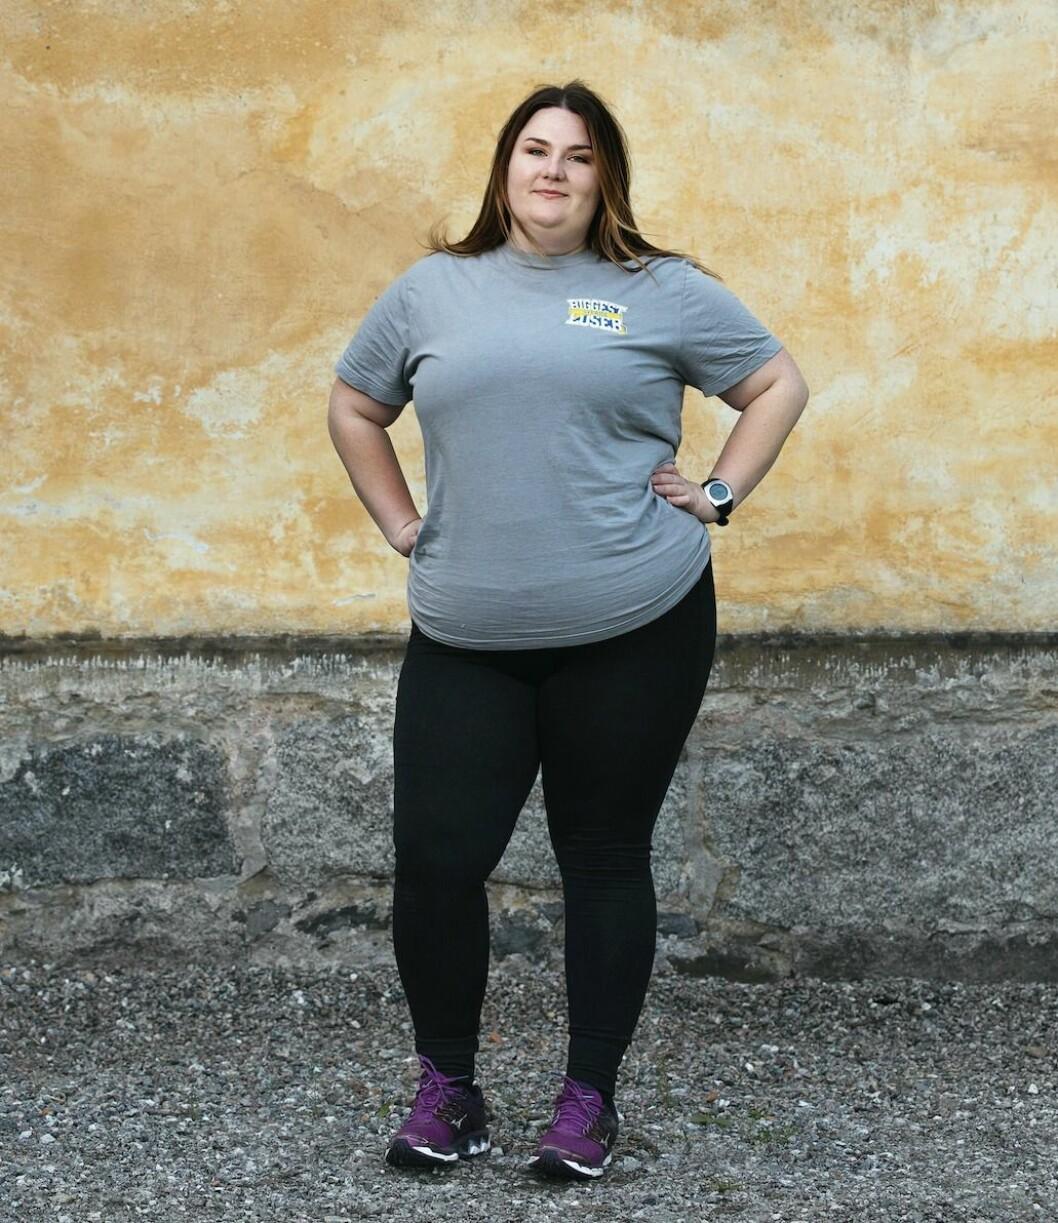 Mona Eriksson, Uppsala, Biggest loser 2020